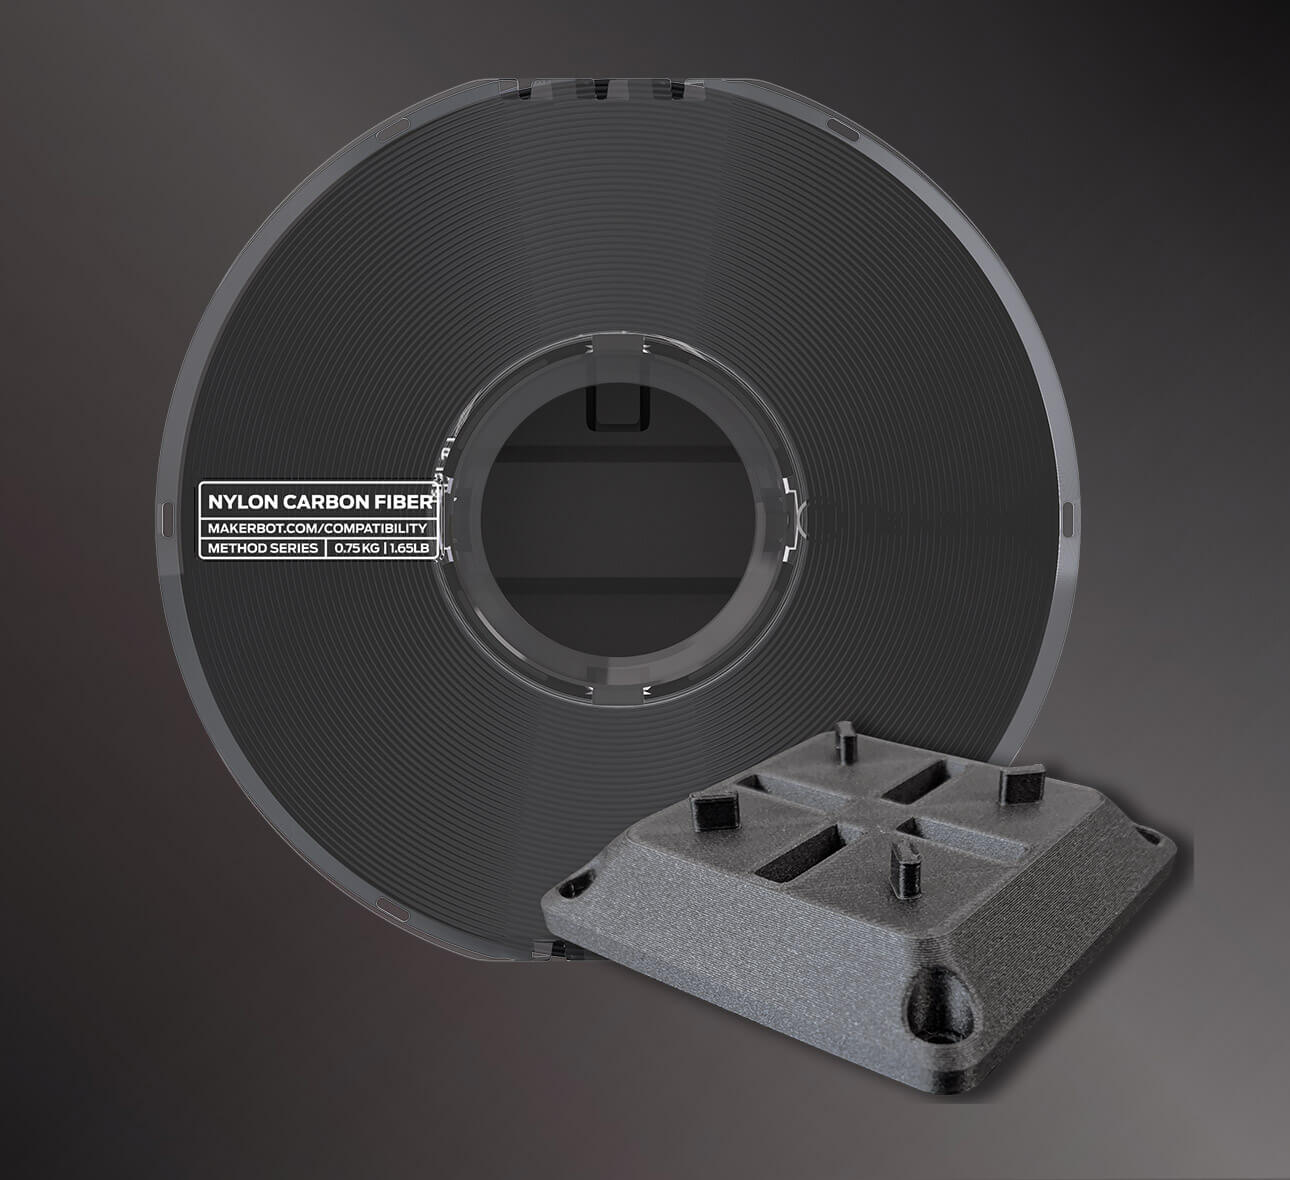 Imprimir Nylon Carbon Fiber